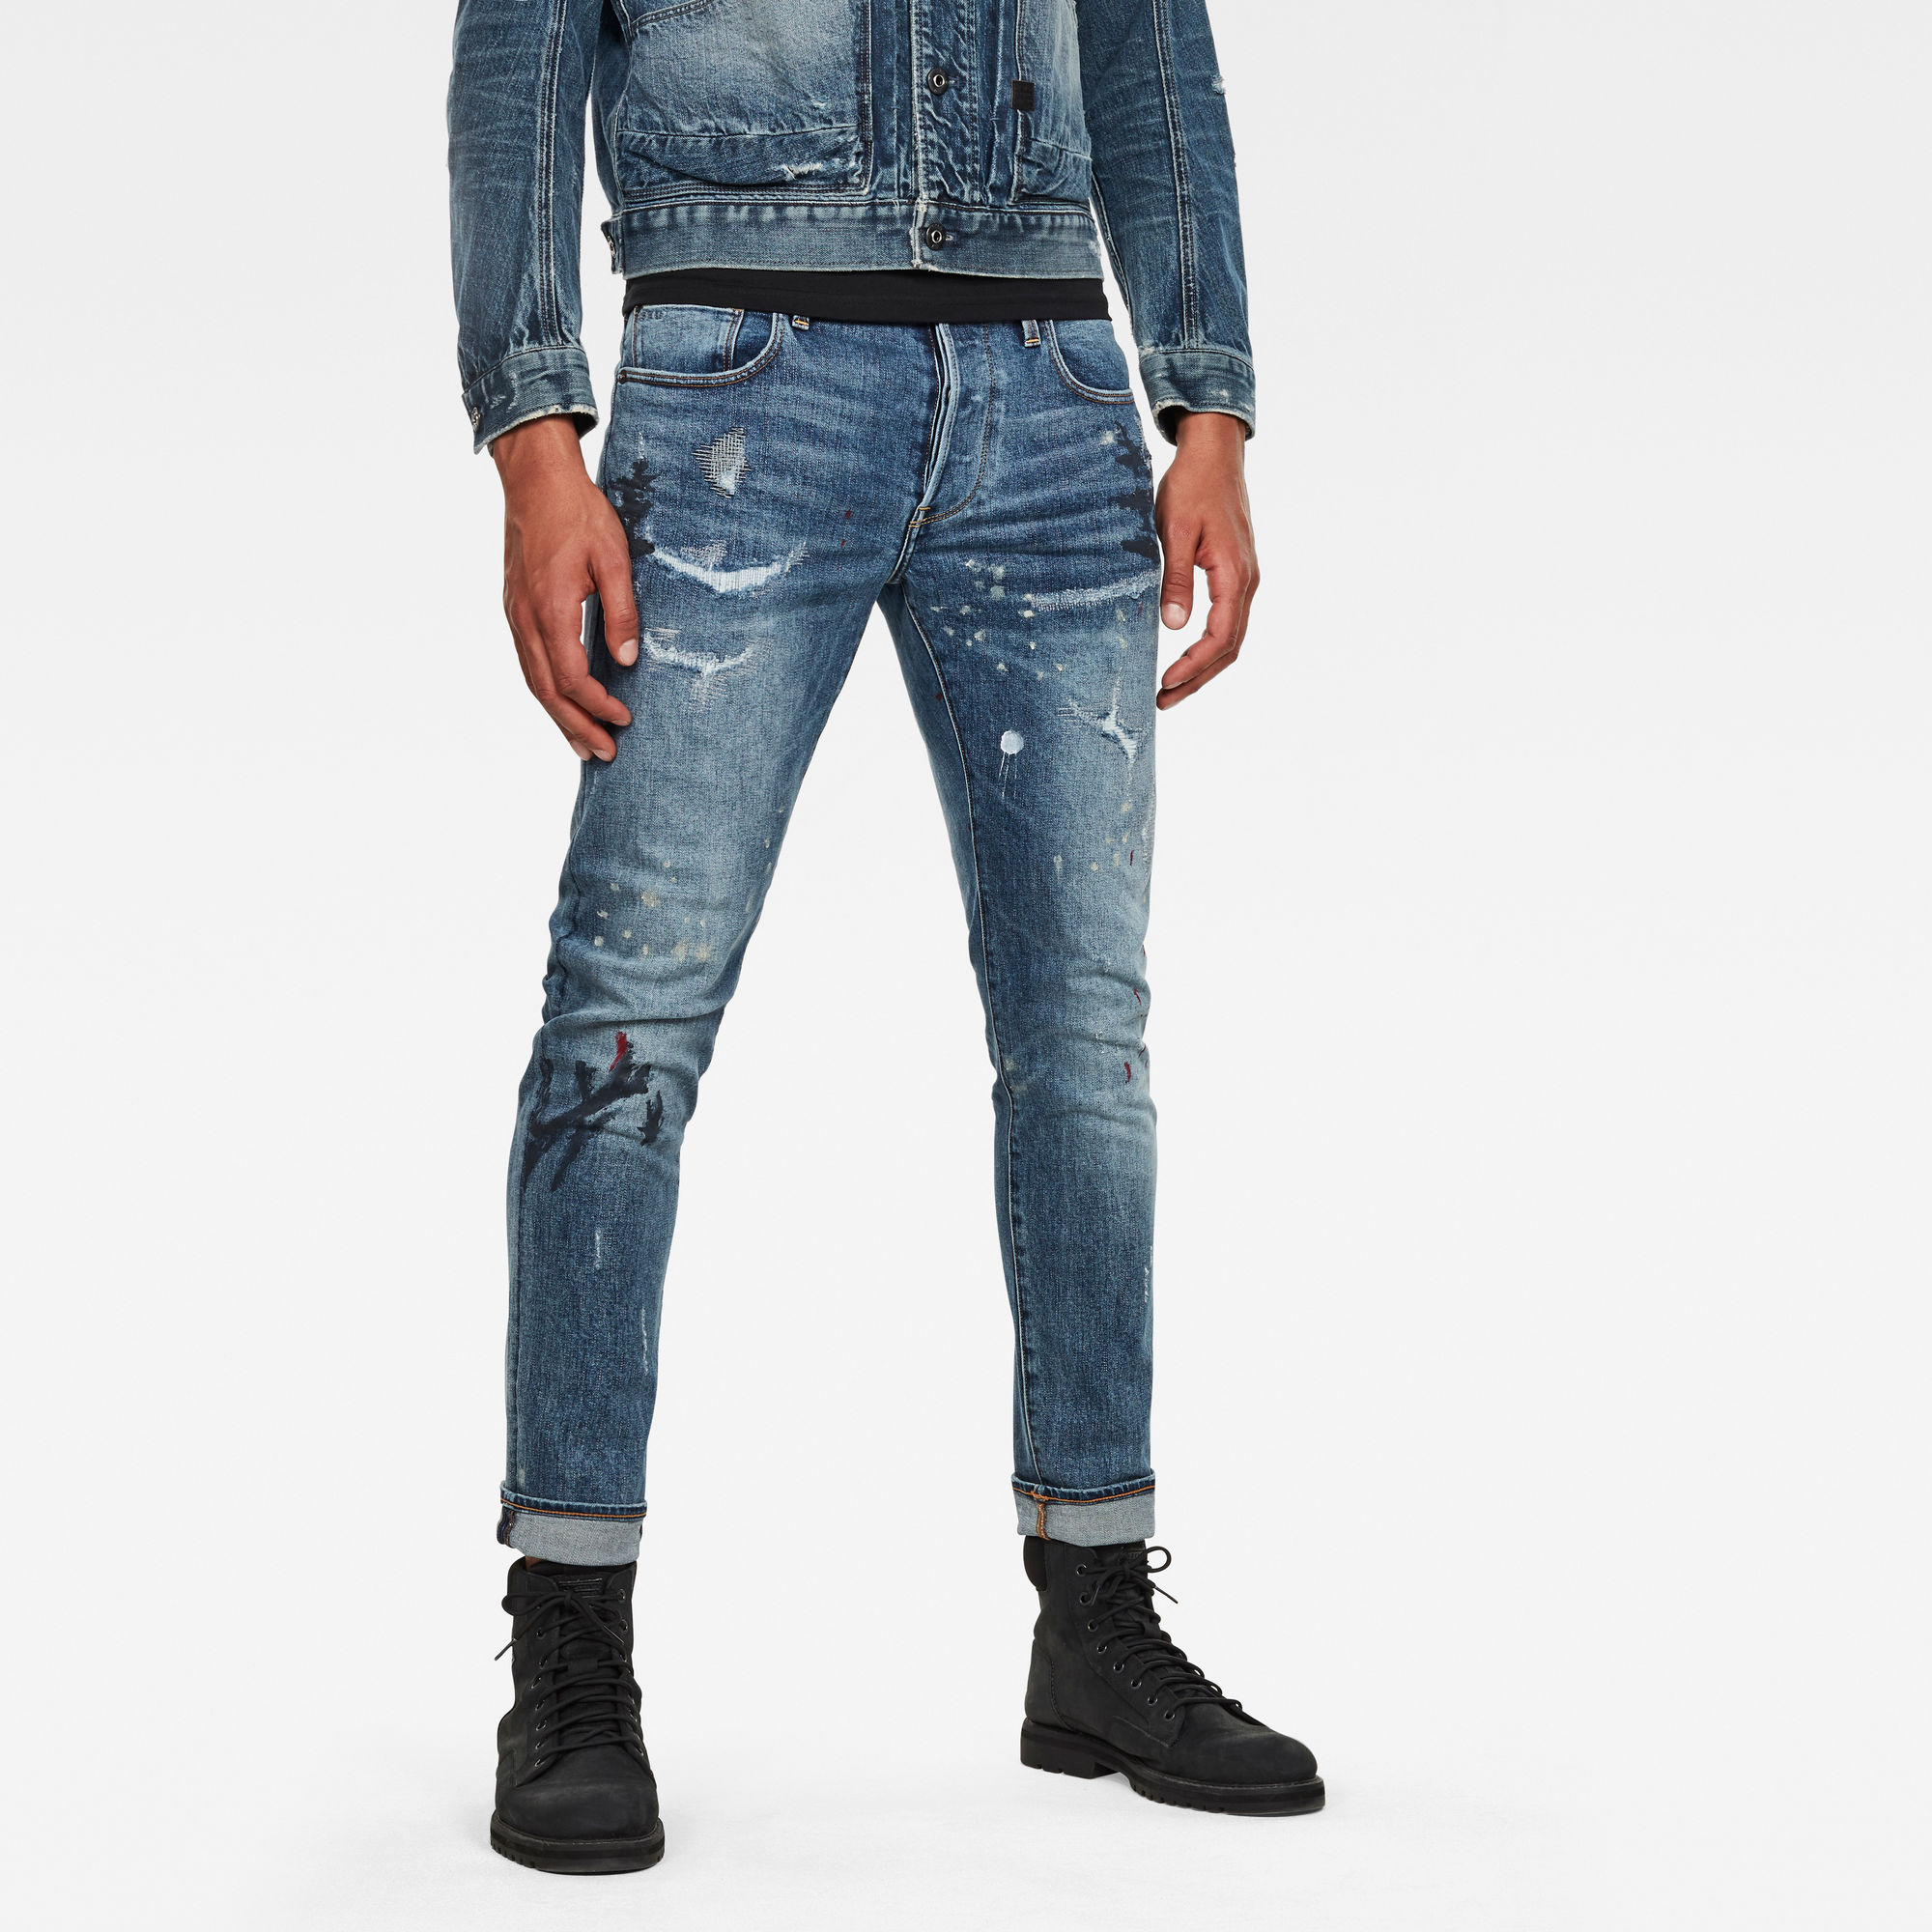 pantalón hombre g-star: Jeans 3301 Slim Azul claro 41